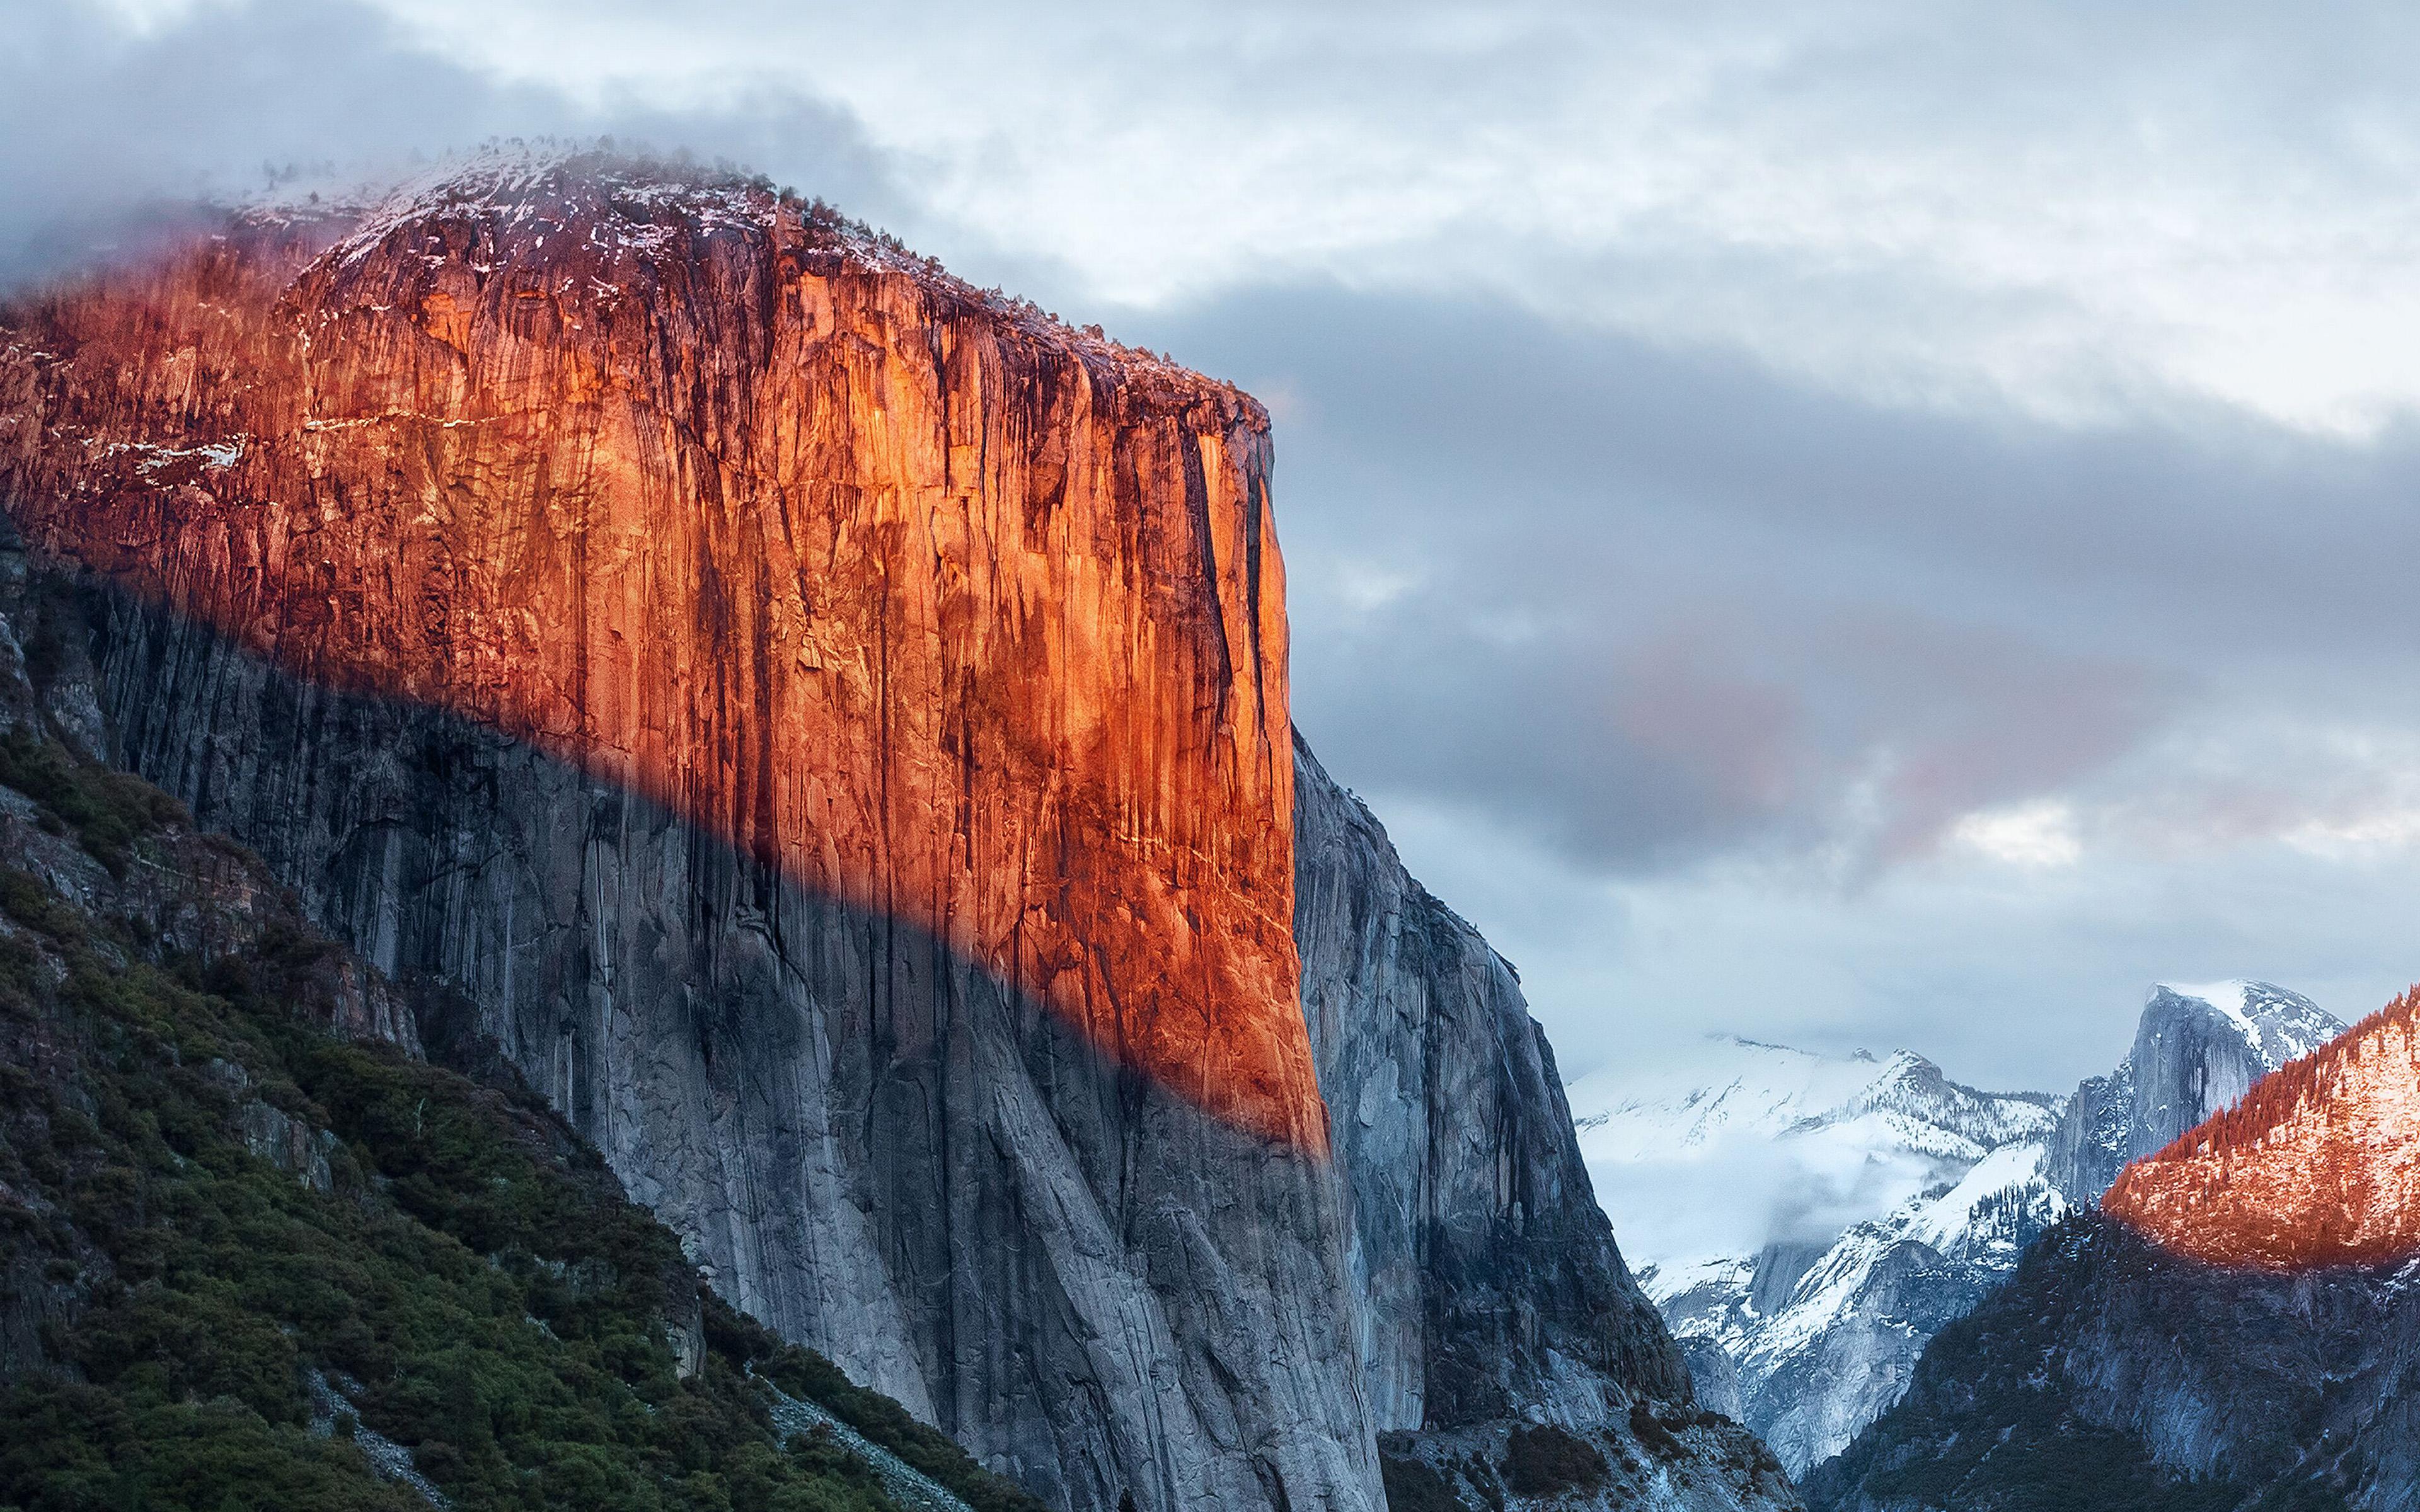 Iphone X Default Wallpaper Am86 Apple El Capitan Osx Mac Mountain Wwdc Nature Papers Co